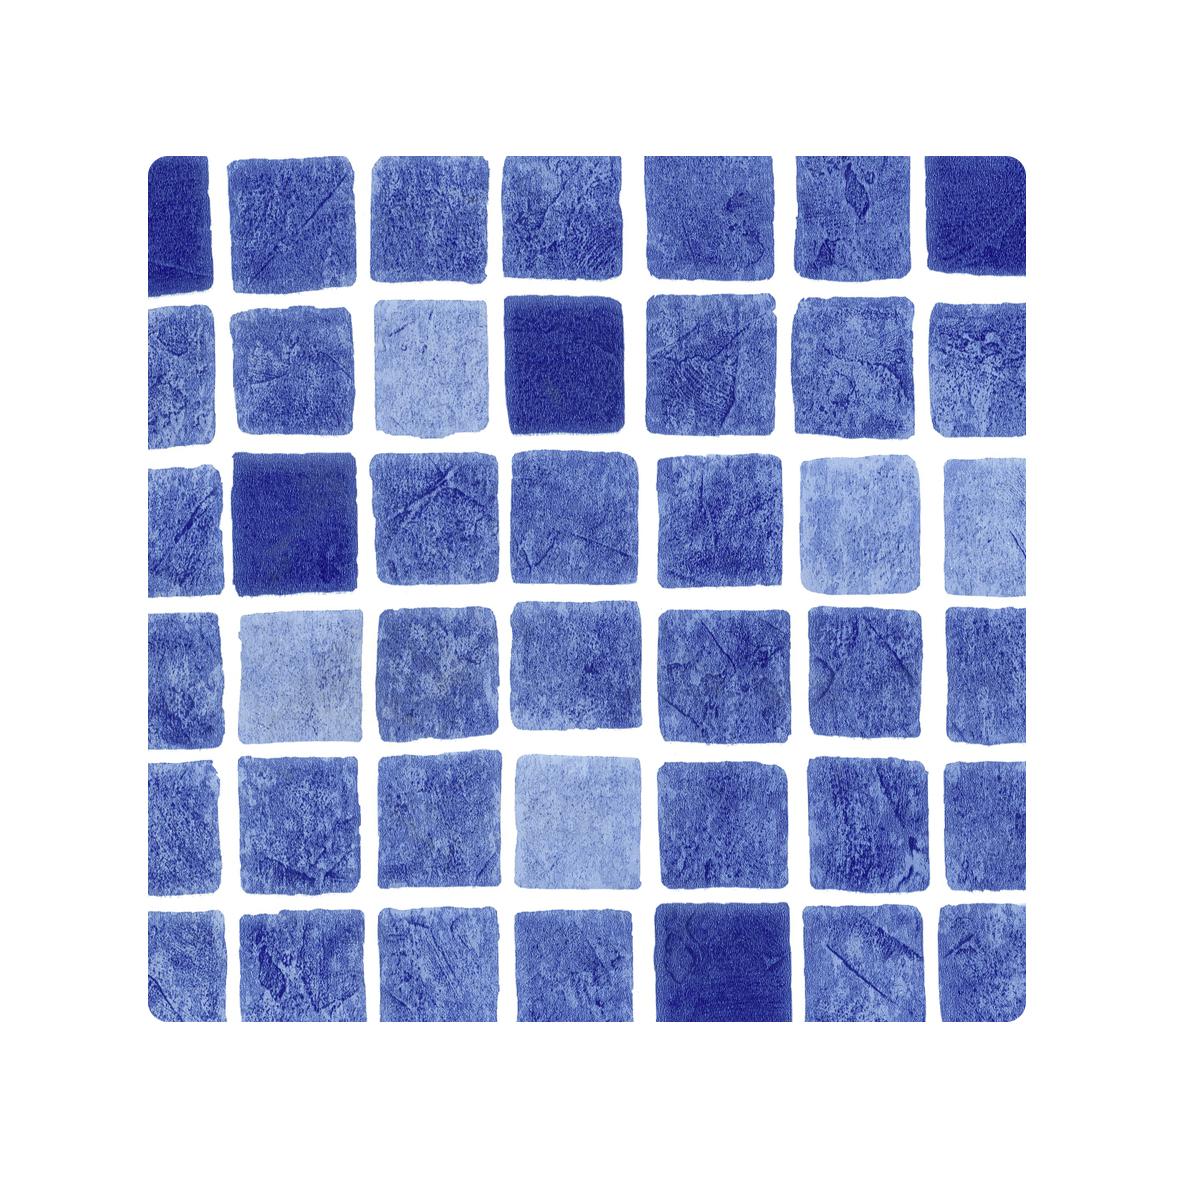 Acryl Schwimmbadfolie deluxe, gewebeverstärkt PVC 1,5 x 165, cm l=25m Rolle bedruckt Mosaikdesign, oceanblau Acryl Schwimmbadfolie deluxe, gewebeverstärkt PVC 1,5 x 165, cm l=25m Rolle bedruckt Mosaikdesign, oceanblau